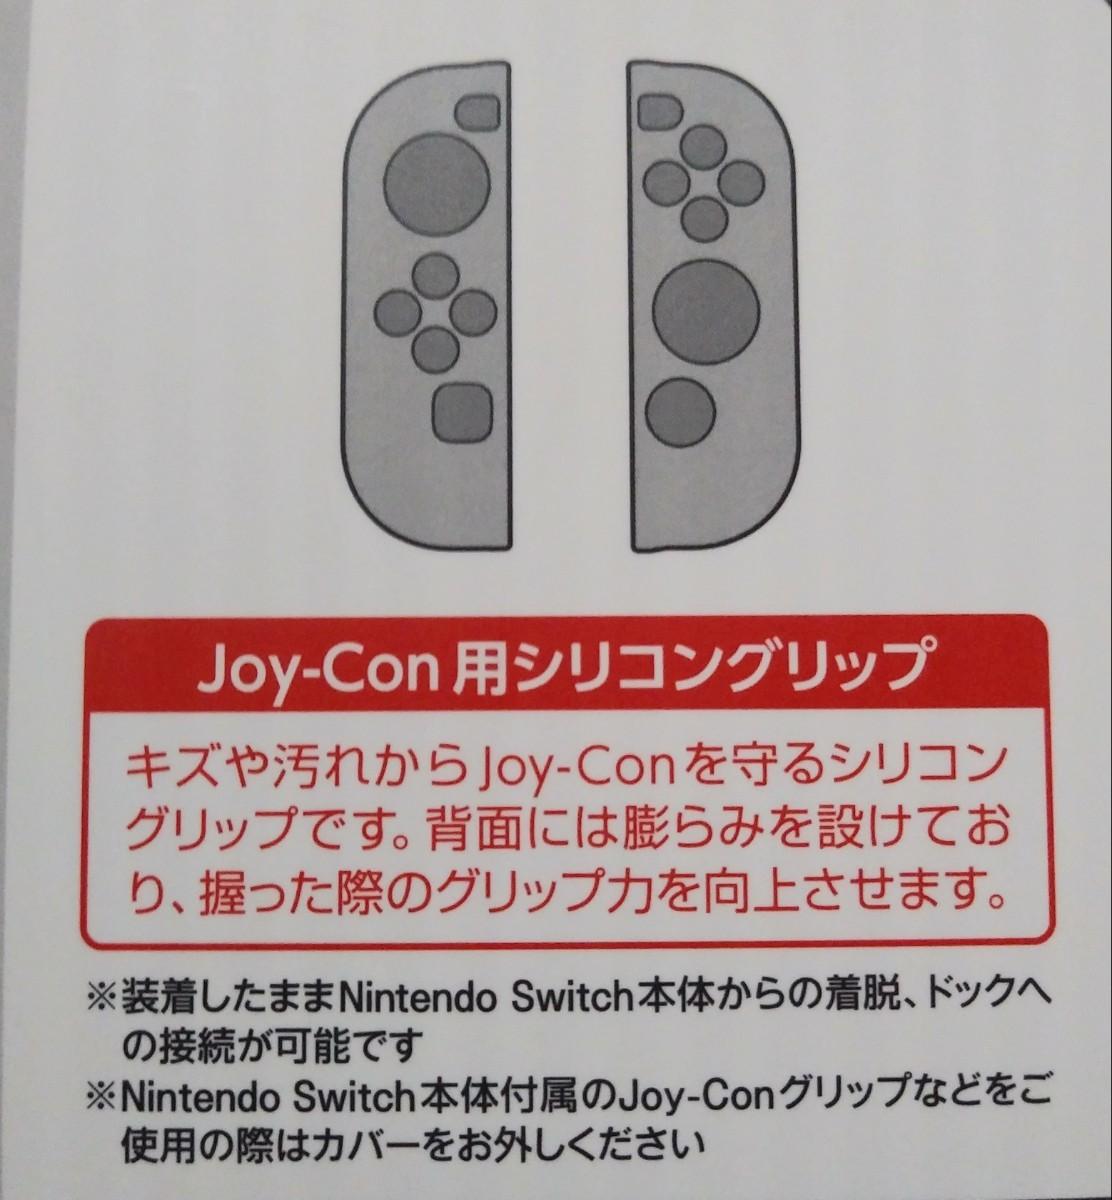 Nintendo Switch  Joy-Con用 シリコン グリップ カバー